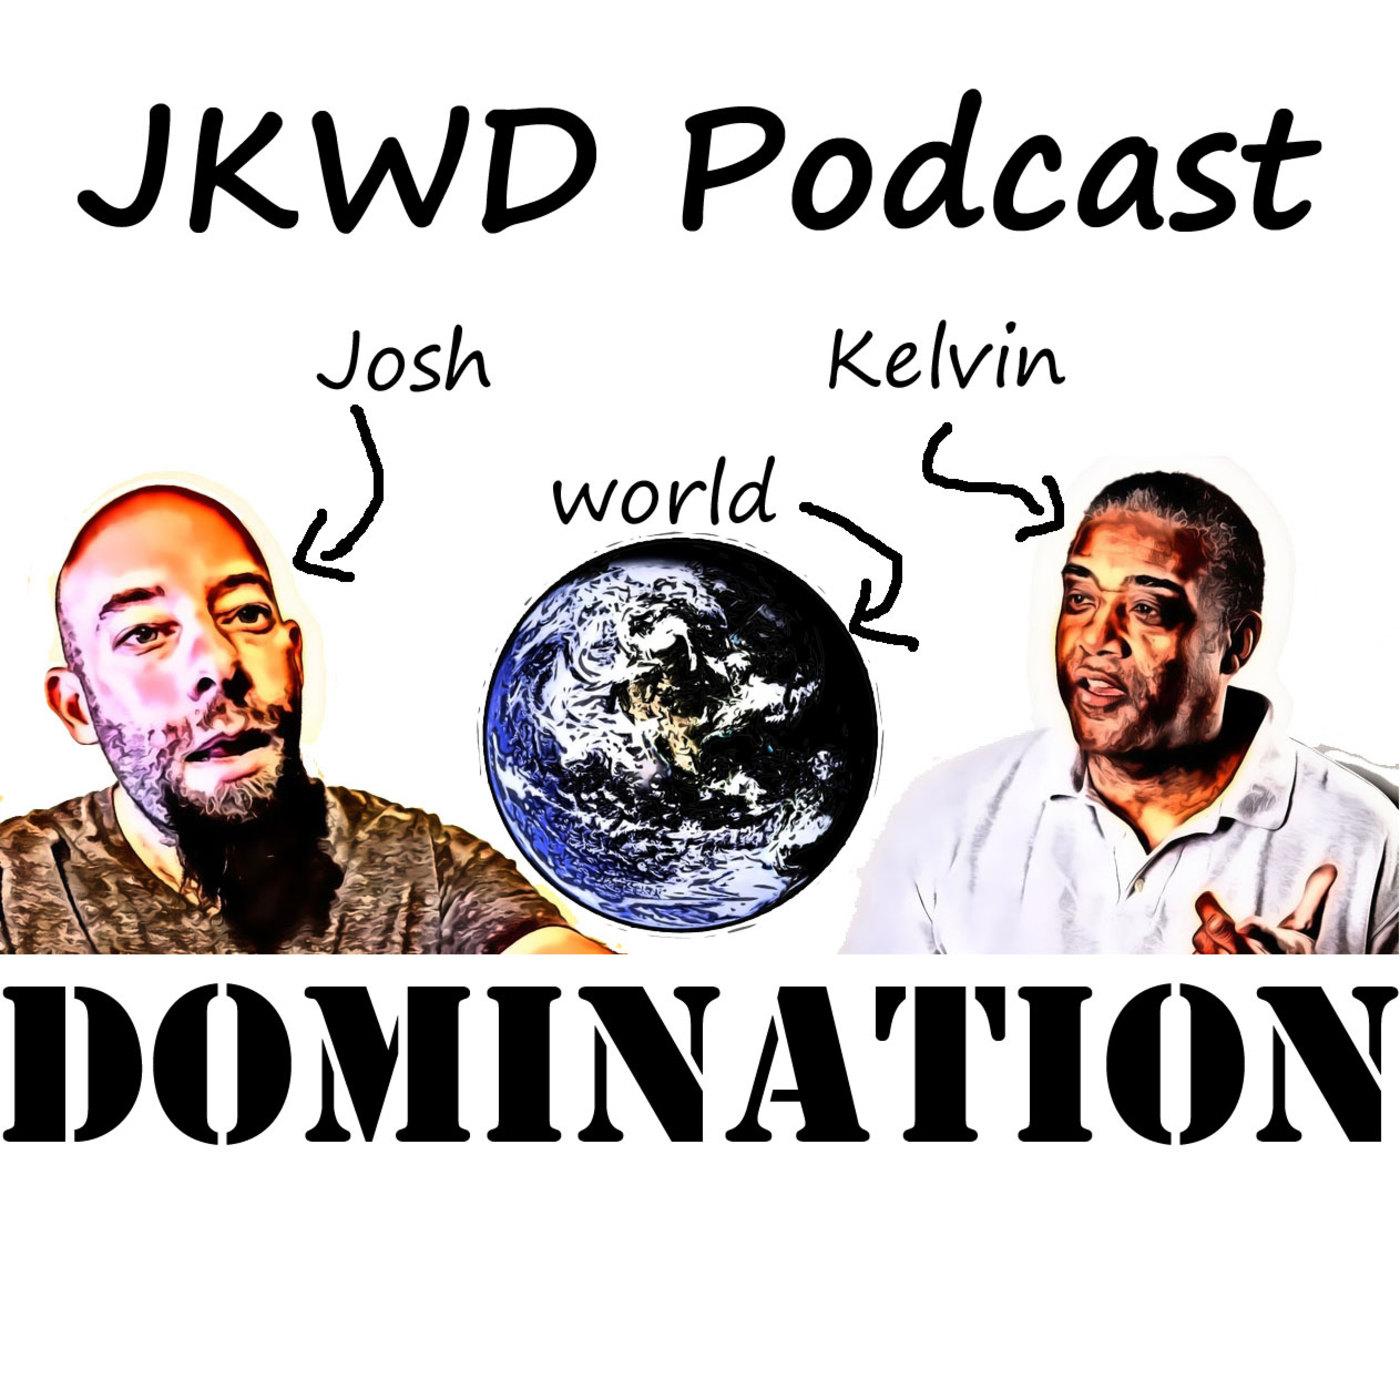 JKWD Podcast show art